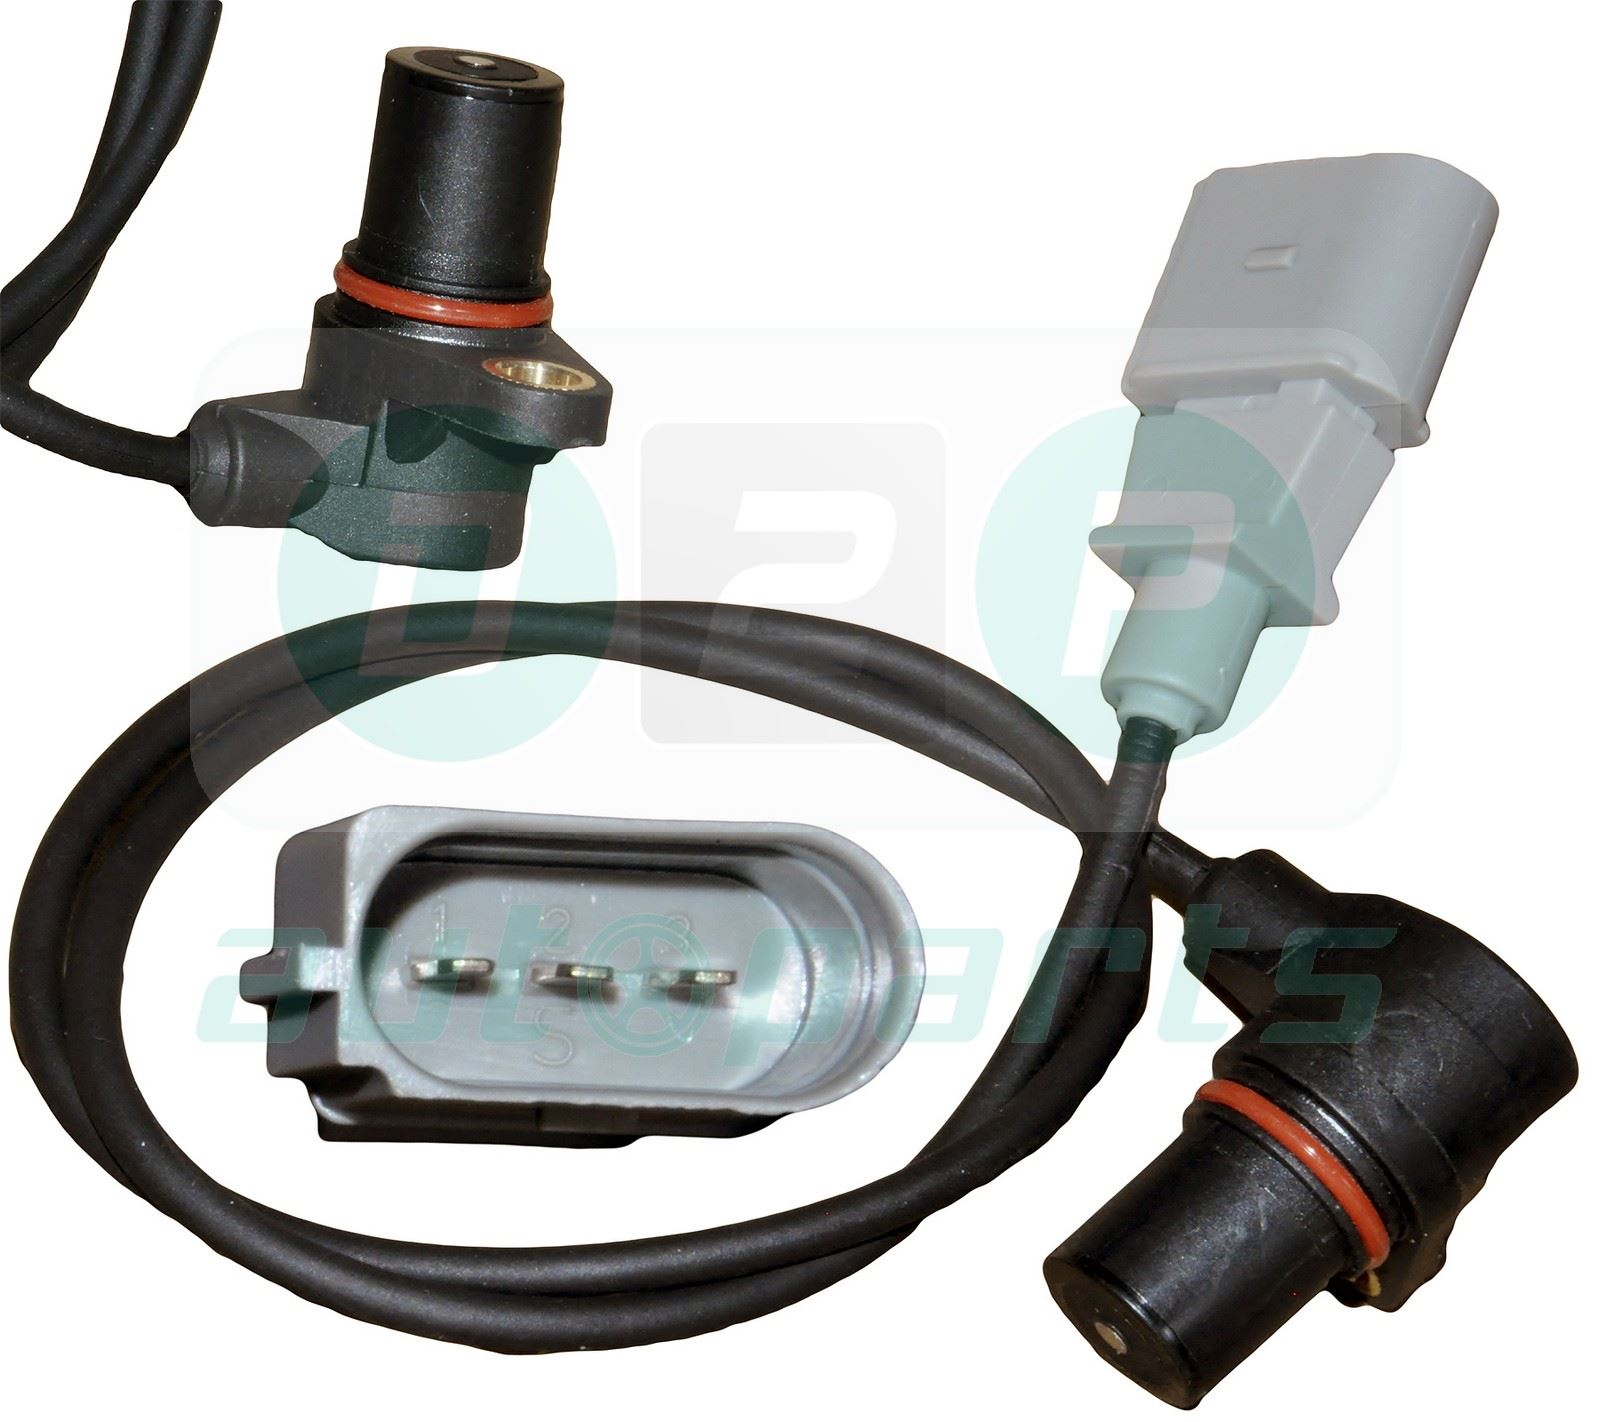 Crankshaft Position Sensor For Audi A3 1.6, 1.8, 1.8T, 1